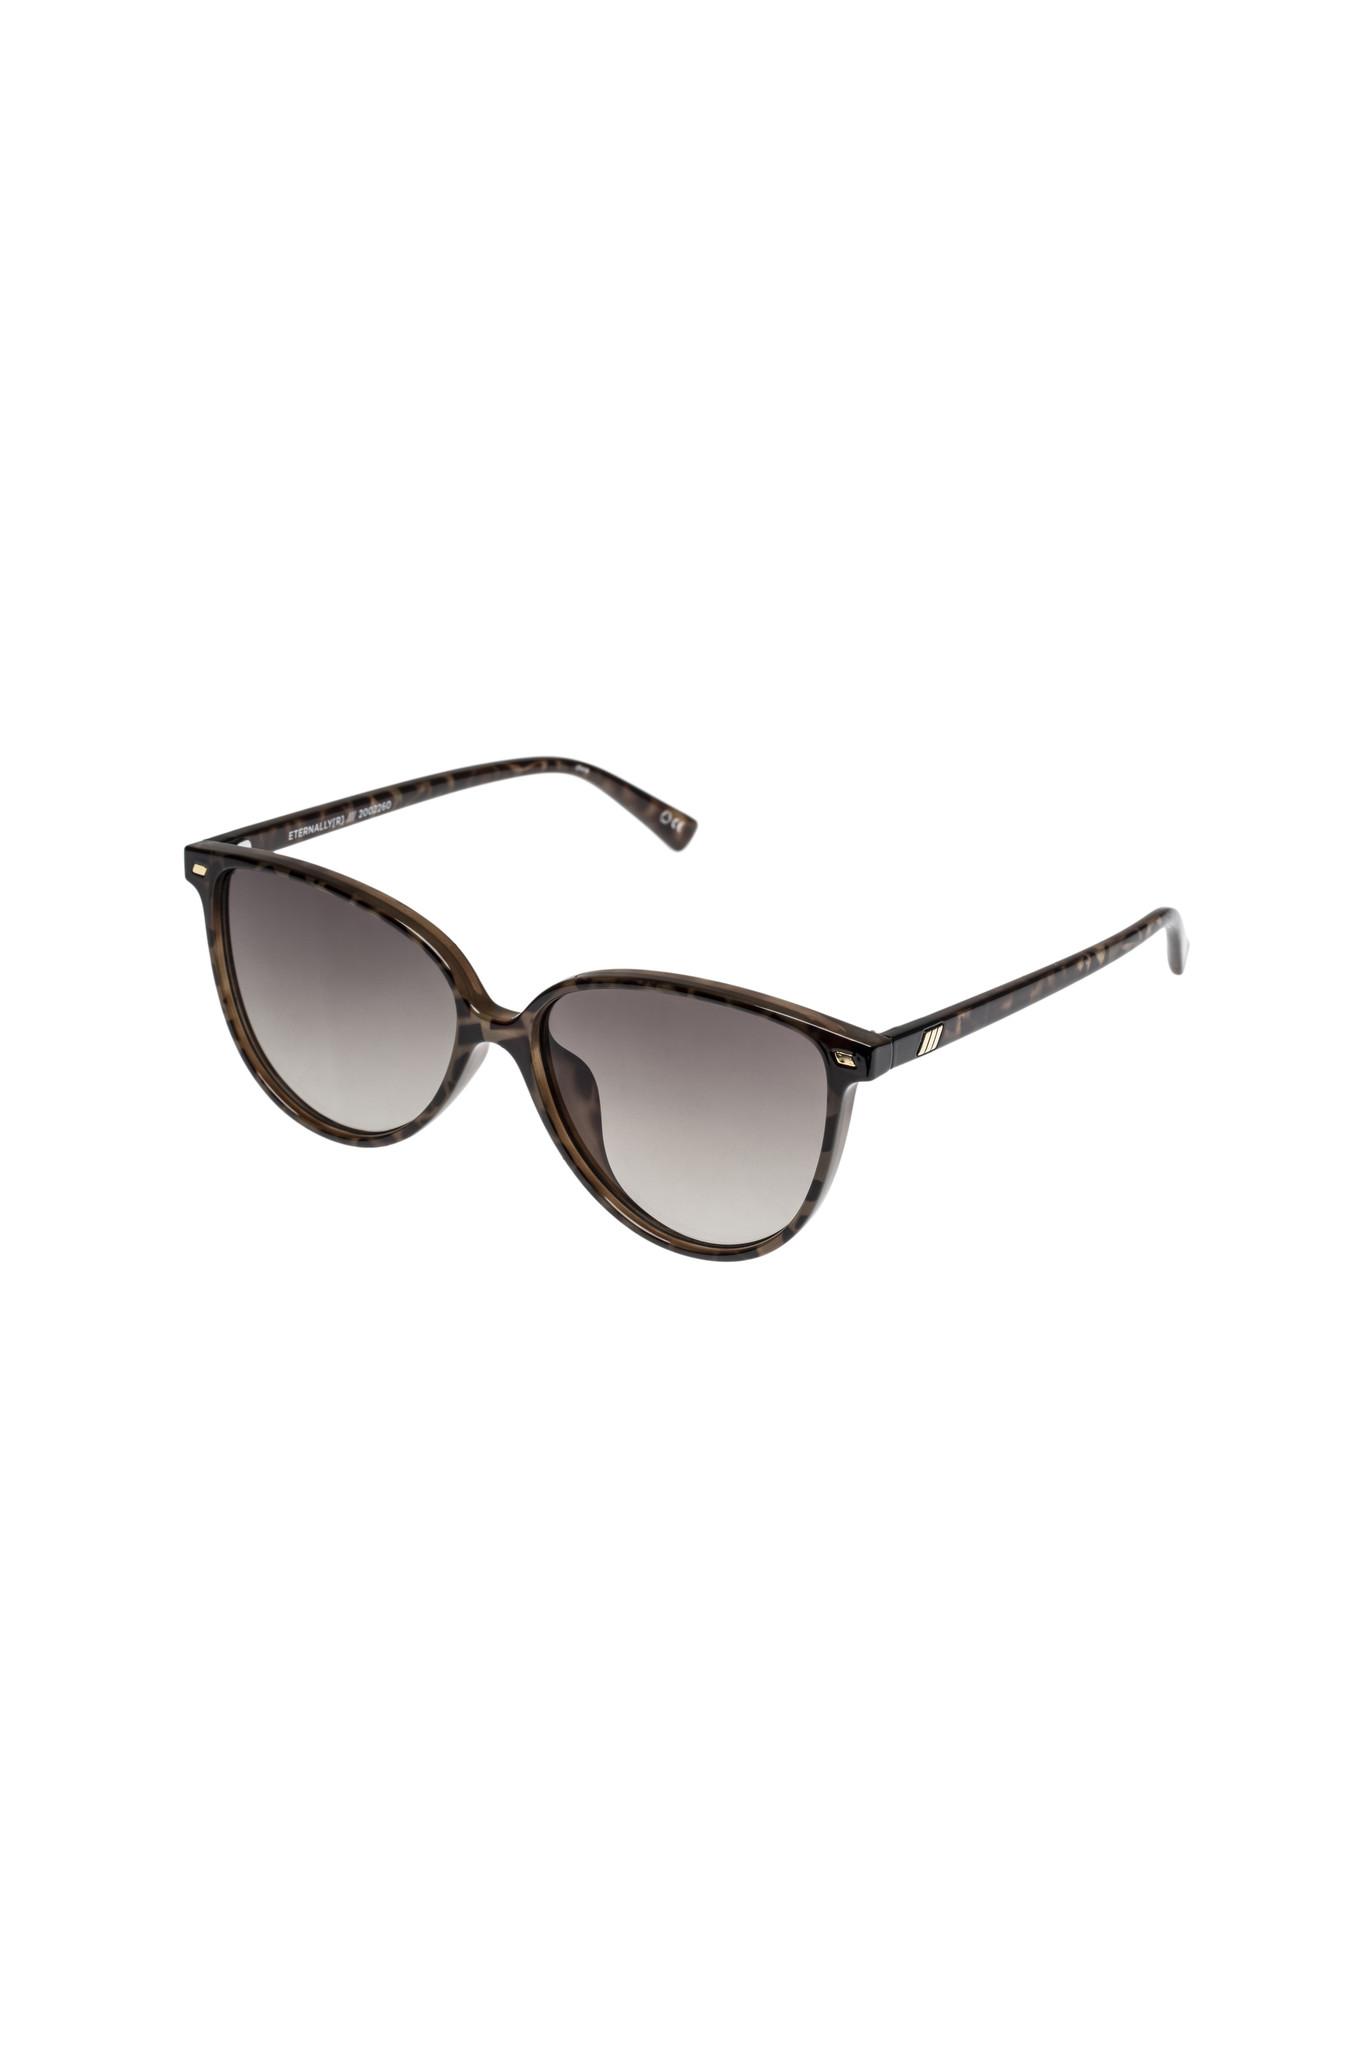 Eternally Sunglasses - Chalky Tort-3